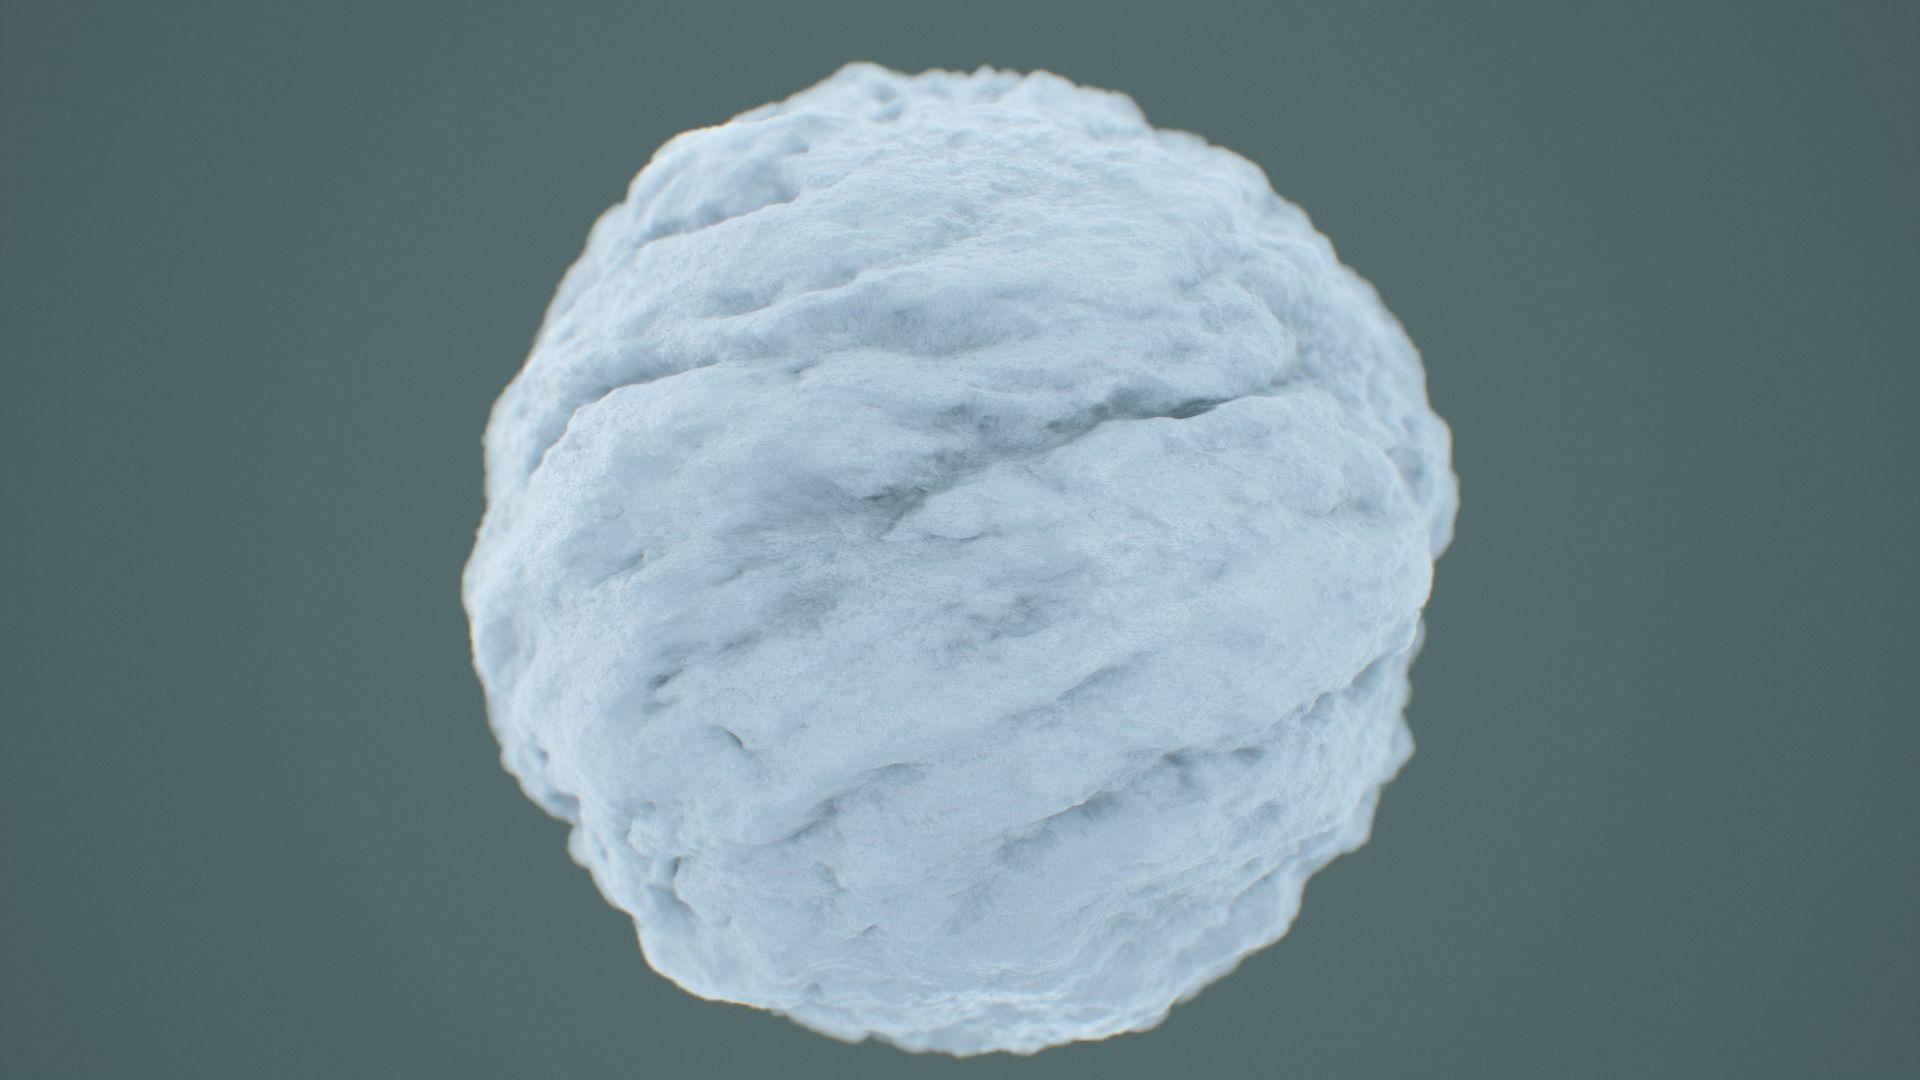 Snow PBR Texture 4K